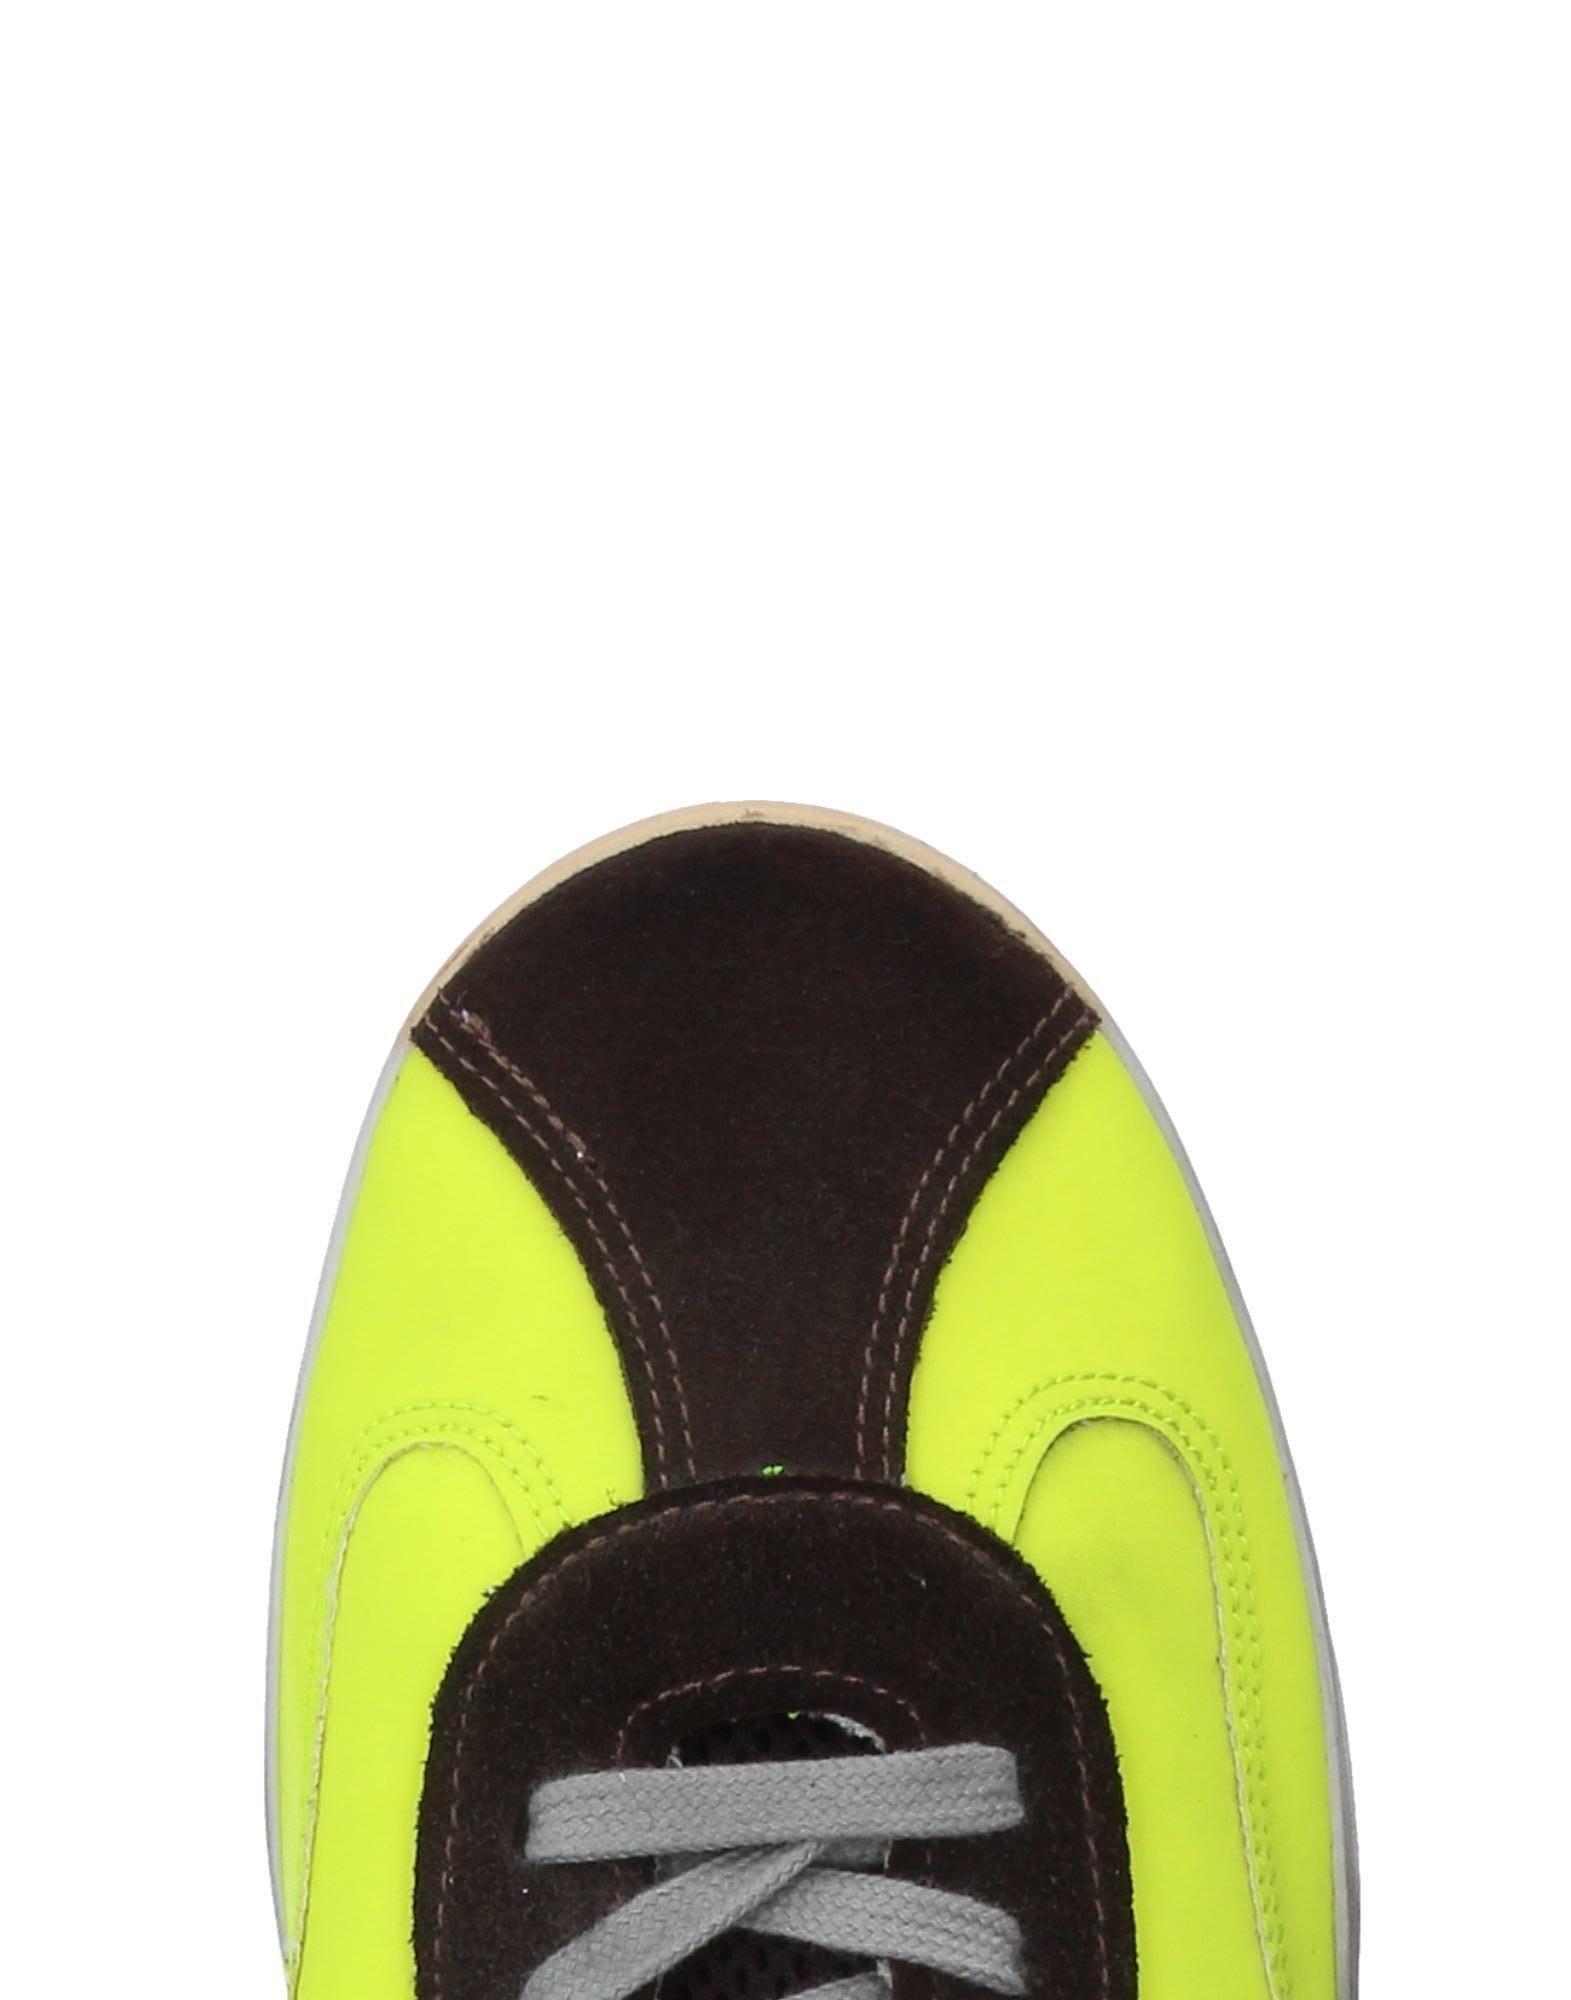 Rabatt echte Schuhe Replika 11298657WC Günstige Günstige Günstige und langlebige Schuhe cd80b7